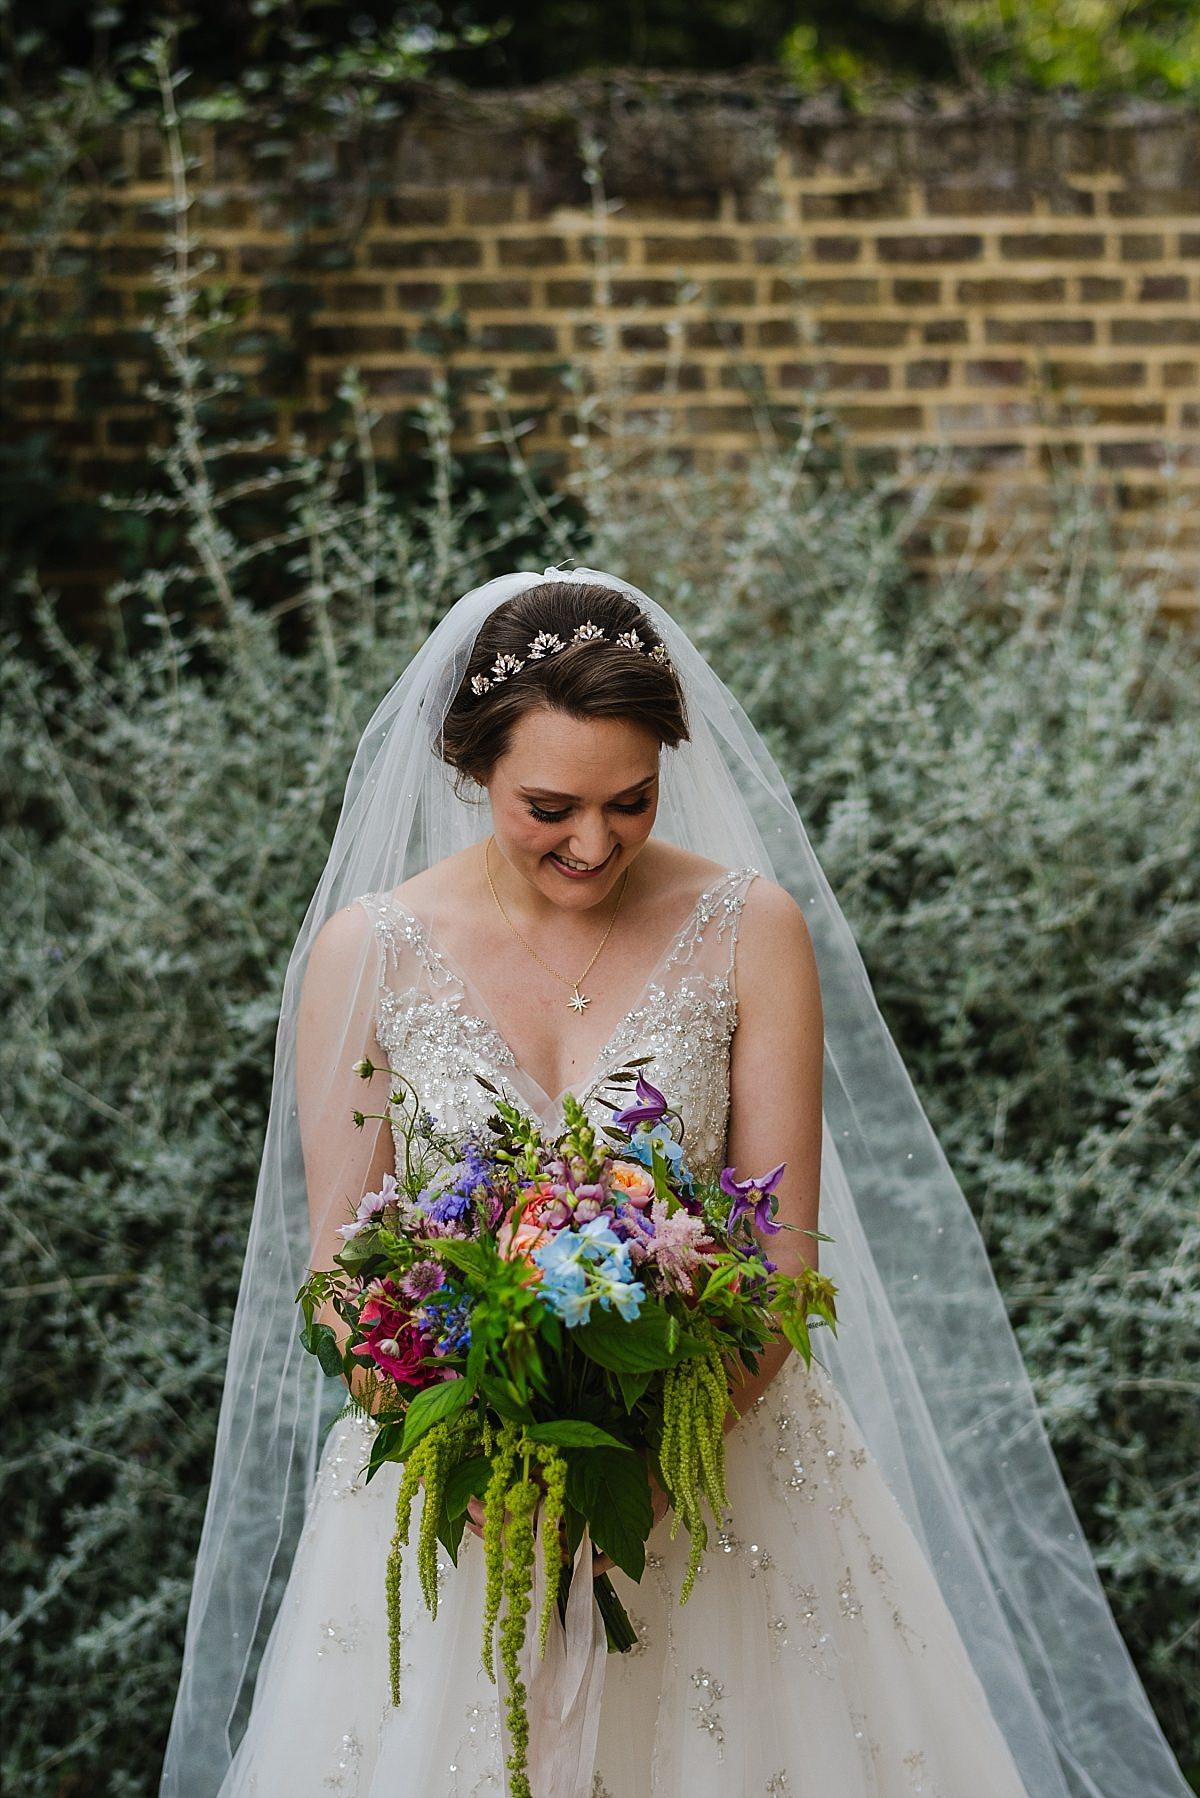 Bride with bouquet at Dorney Court